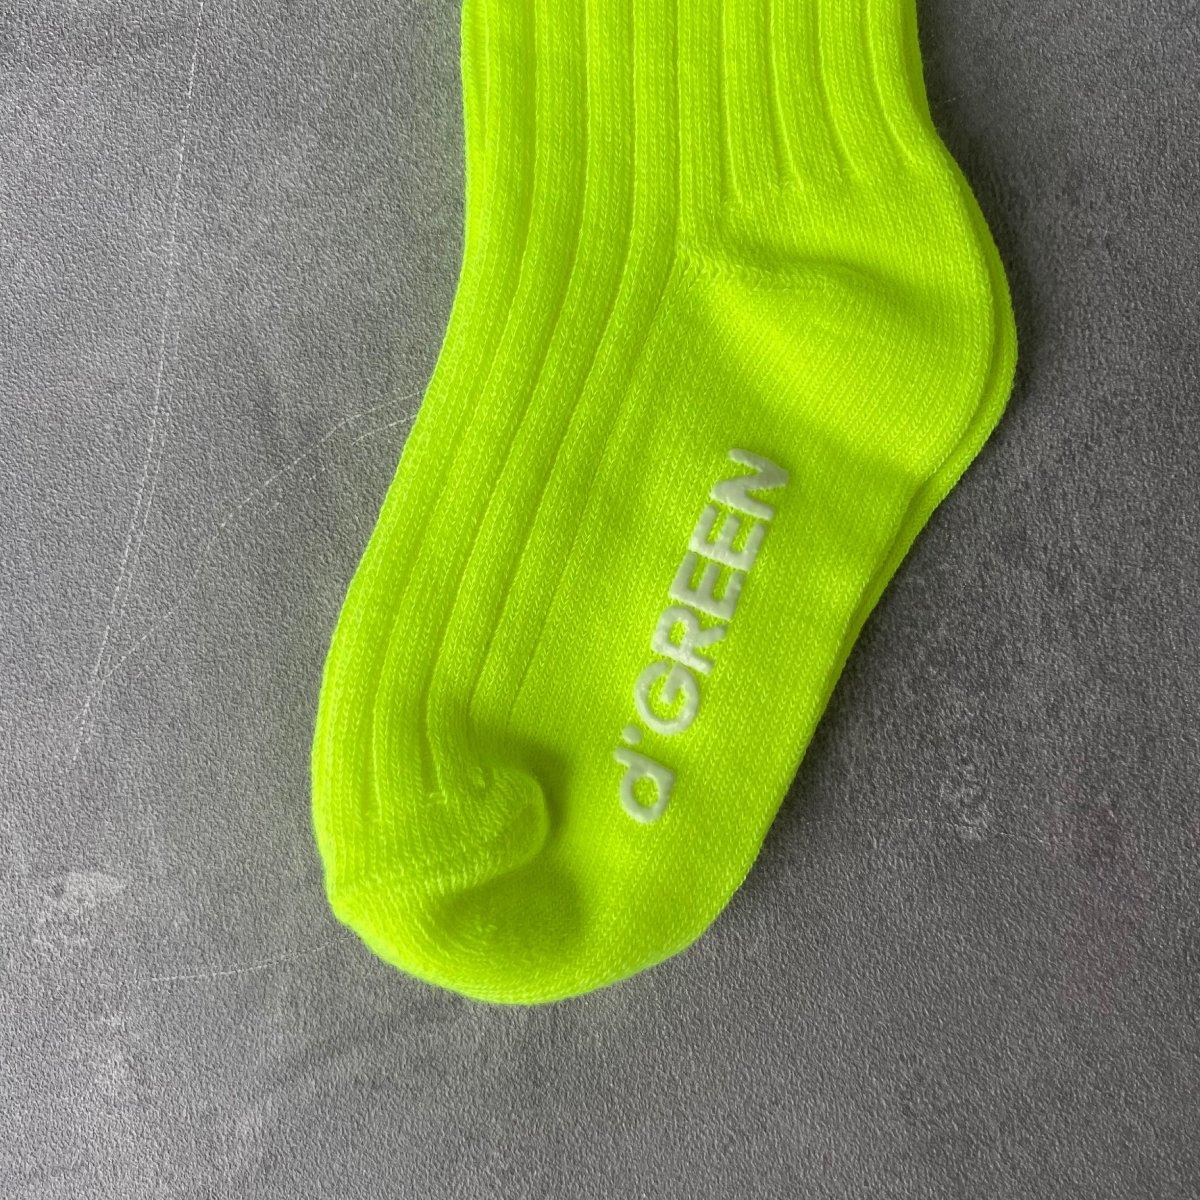 【BABY】Neon Socks 詳細画像10